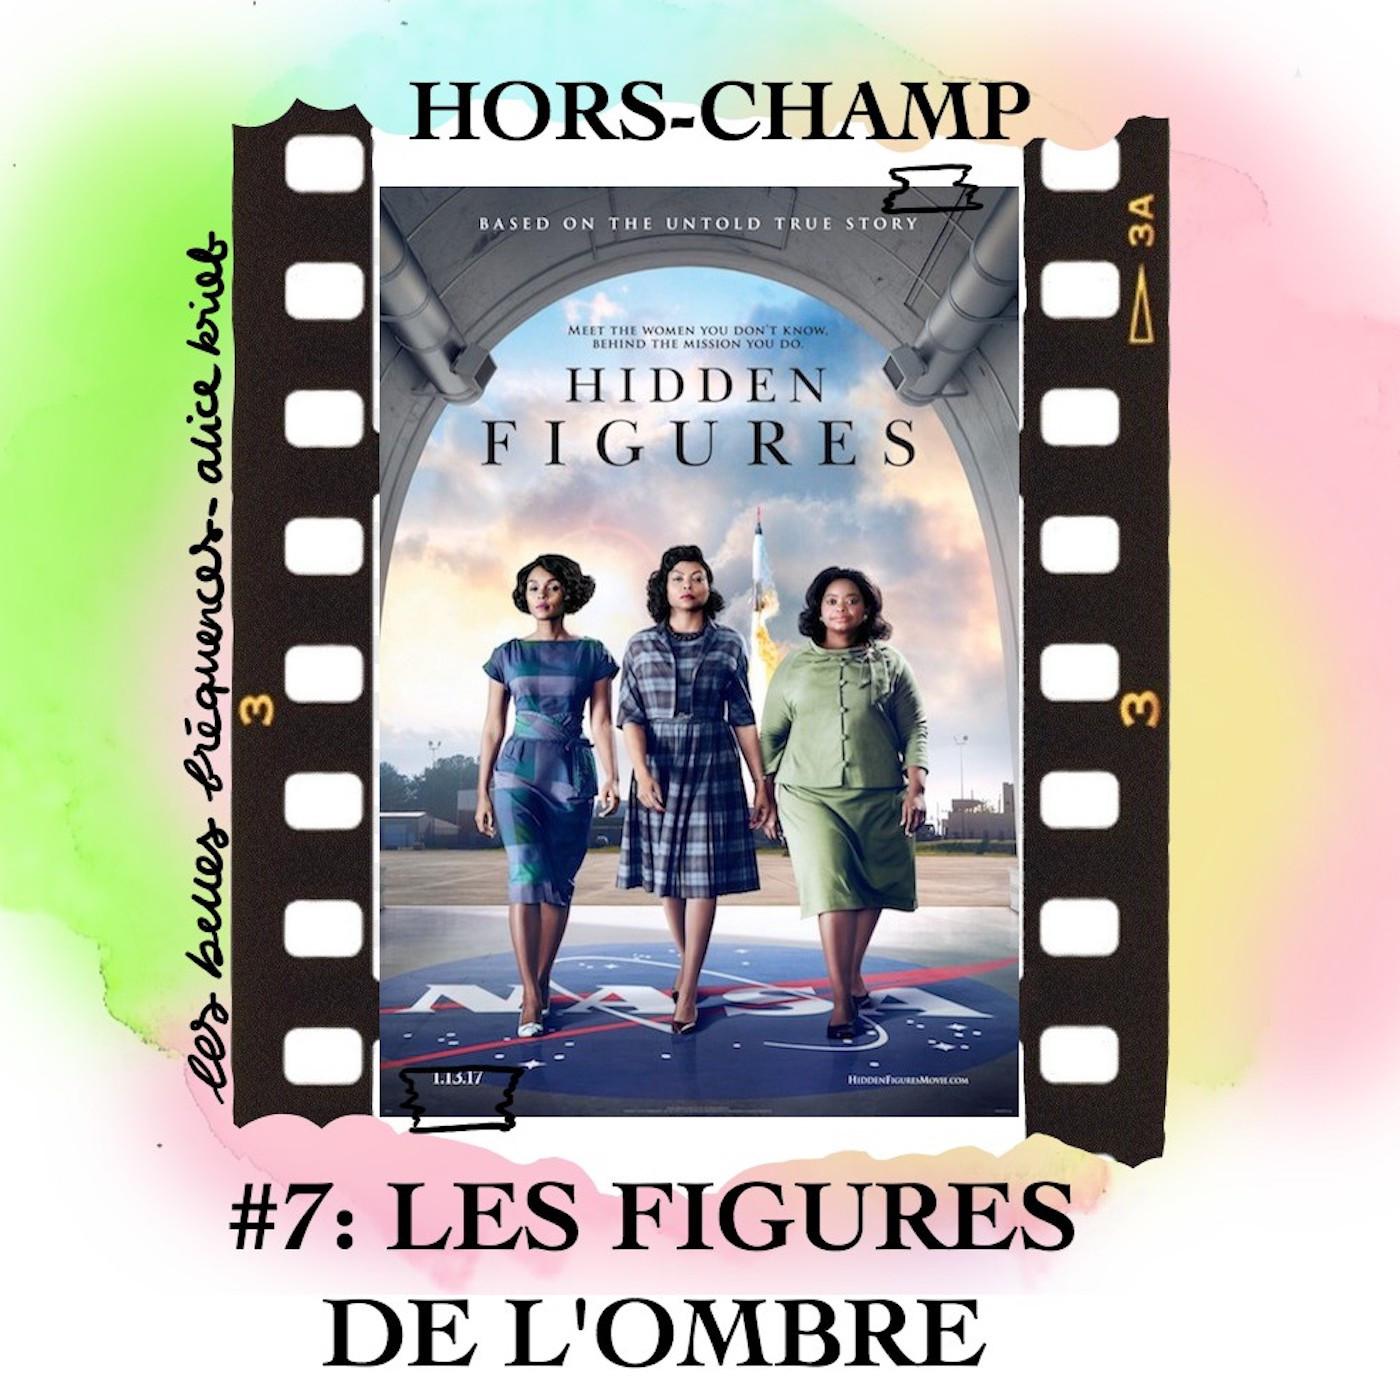 #7 : Les Figures de l'Ombre